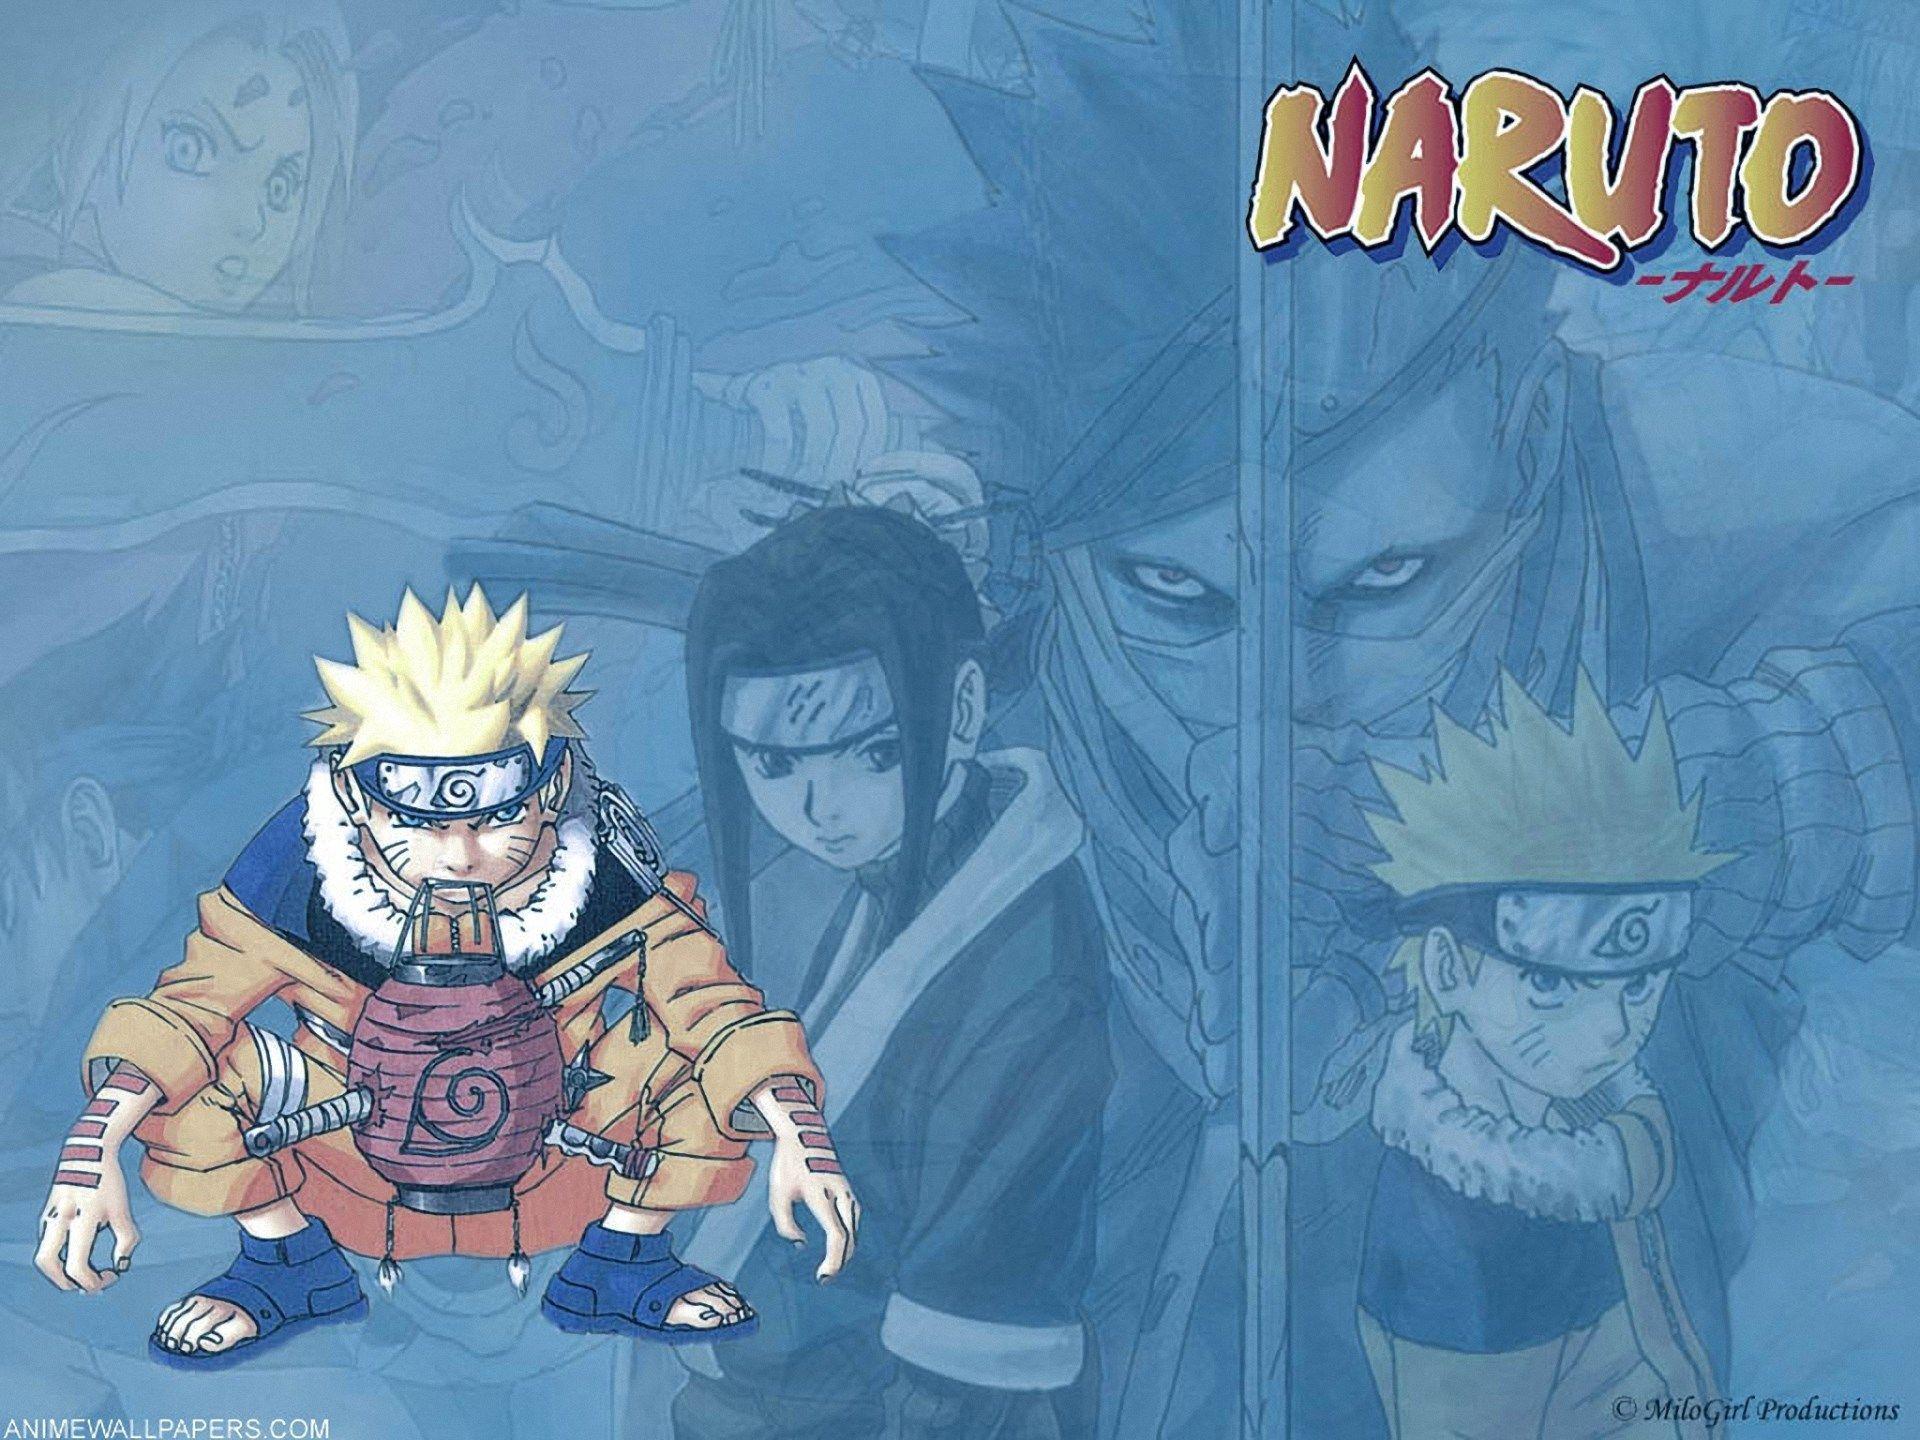 Top Wallpaper Naruto Blue - 90fcc61572fb924b0fdce221ac85e6c6  2018_1001865.jpg